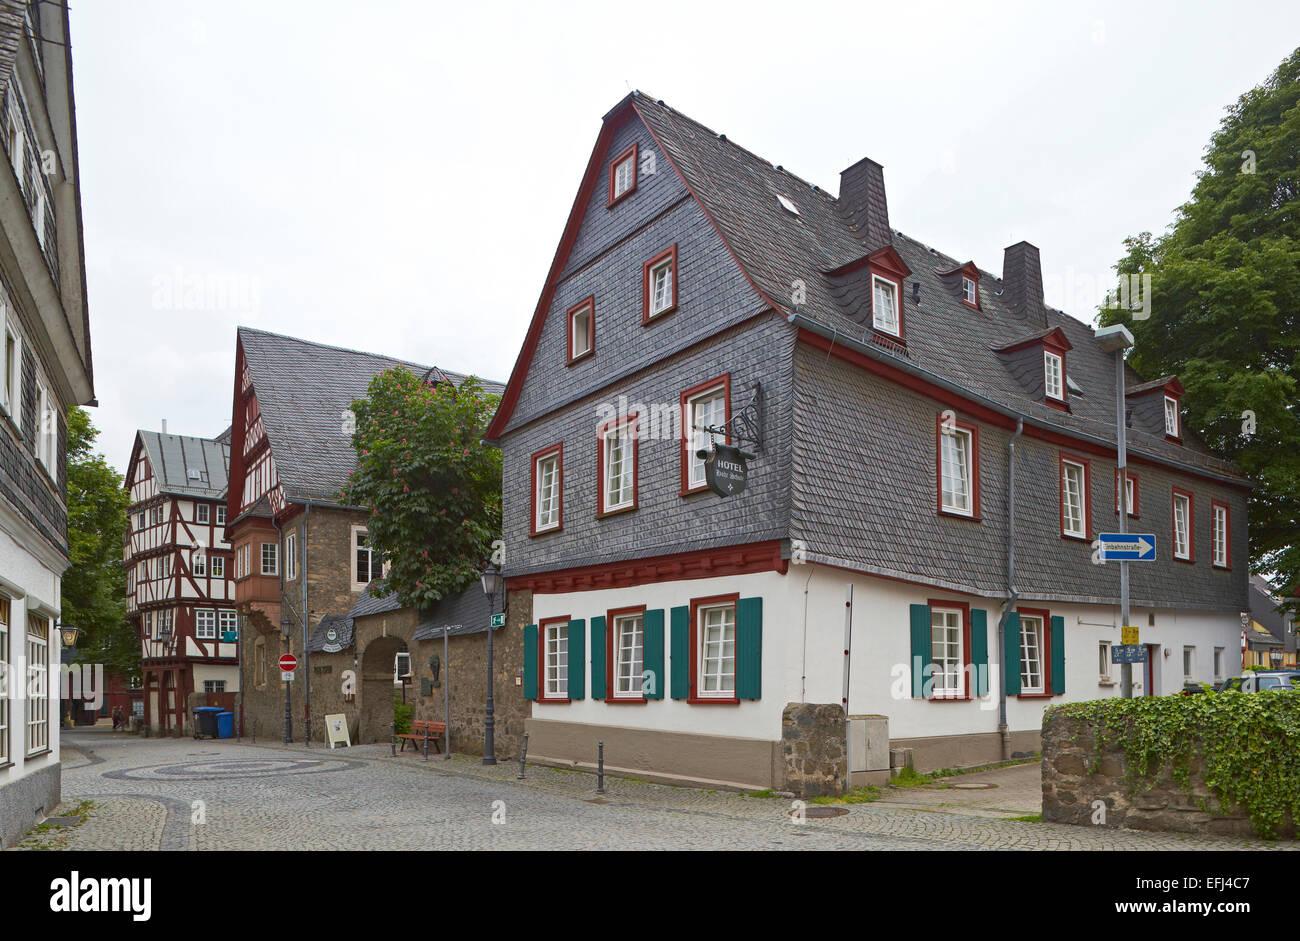 Former academy Hohe Schule Herborn, 1590-92, Herborn, Westerwald, Hesse, Germany, Europe - Stock Image